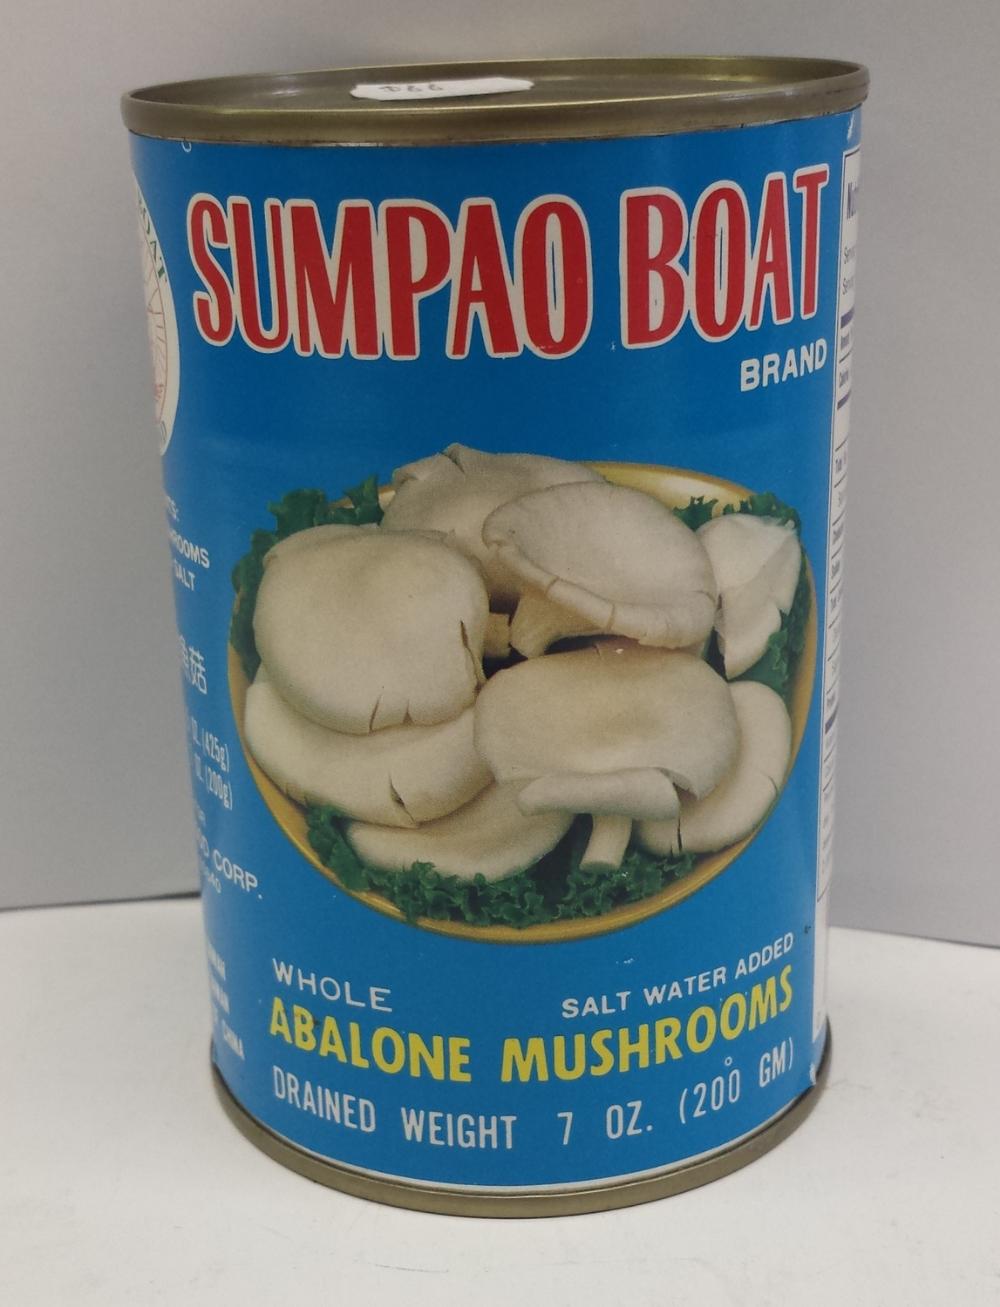 Abalone Mushroom    Sumpao Boat   MU11105 24x15 oz